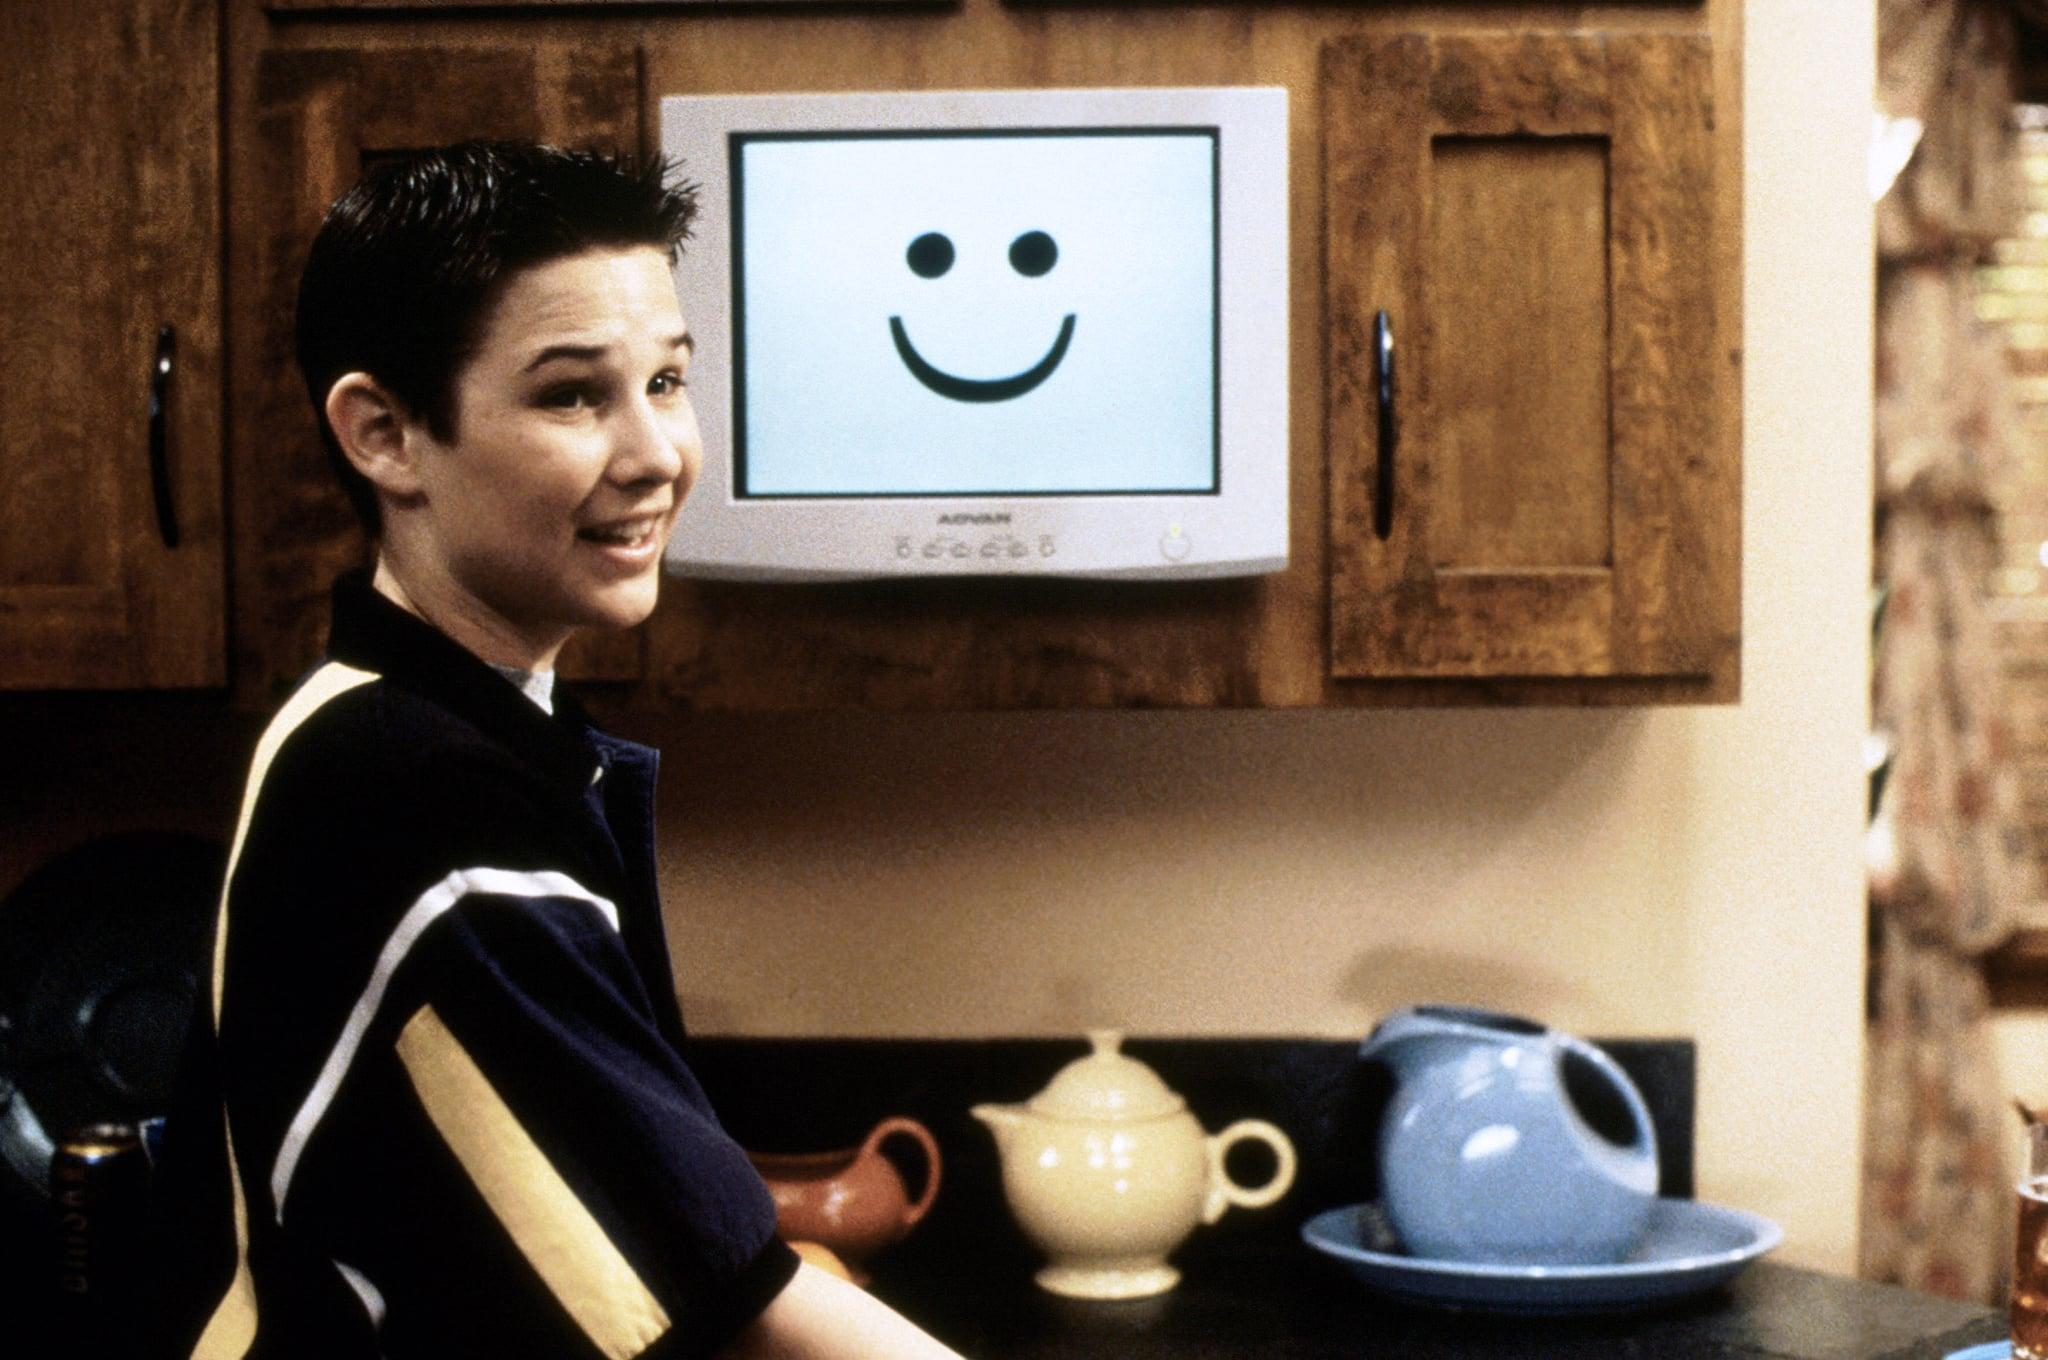 SMART HOUSE, Ryan Merriman, 1999.  Disney Channel  / Courtesy: Everett Collection